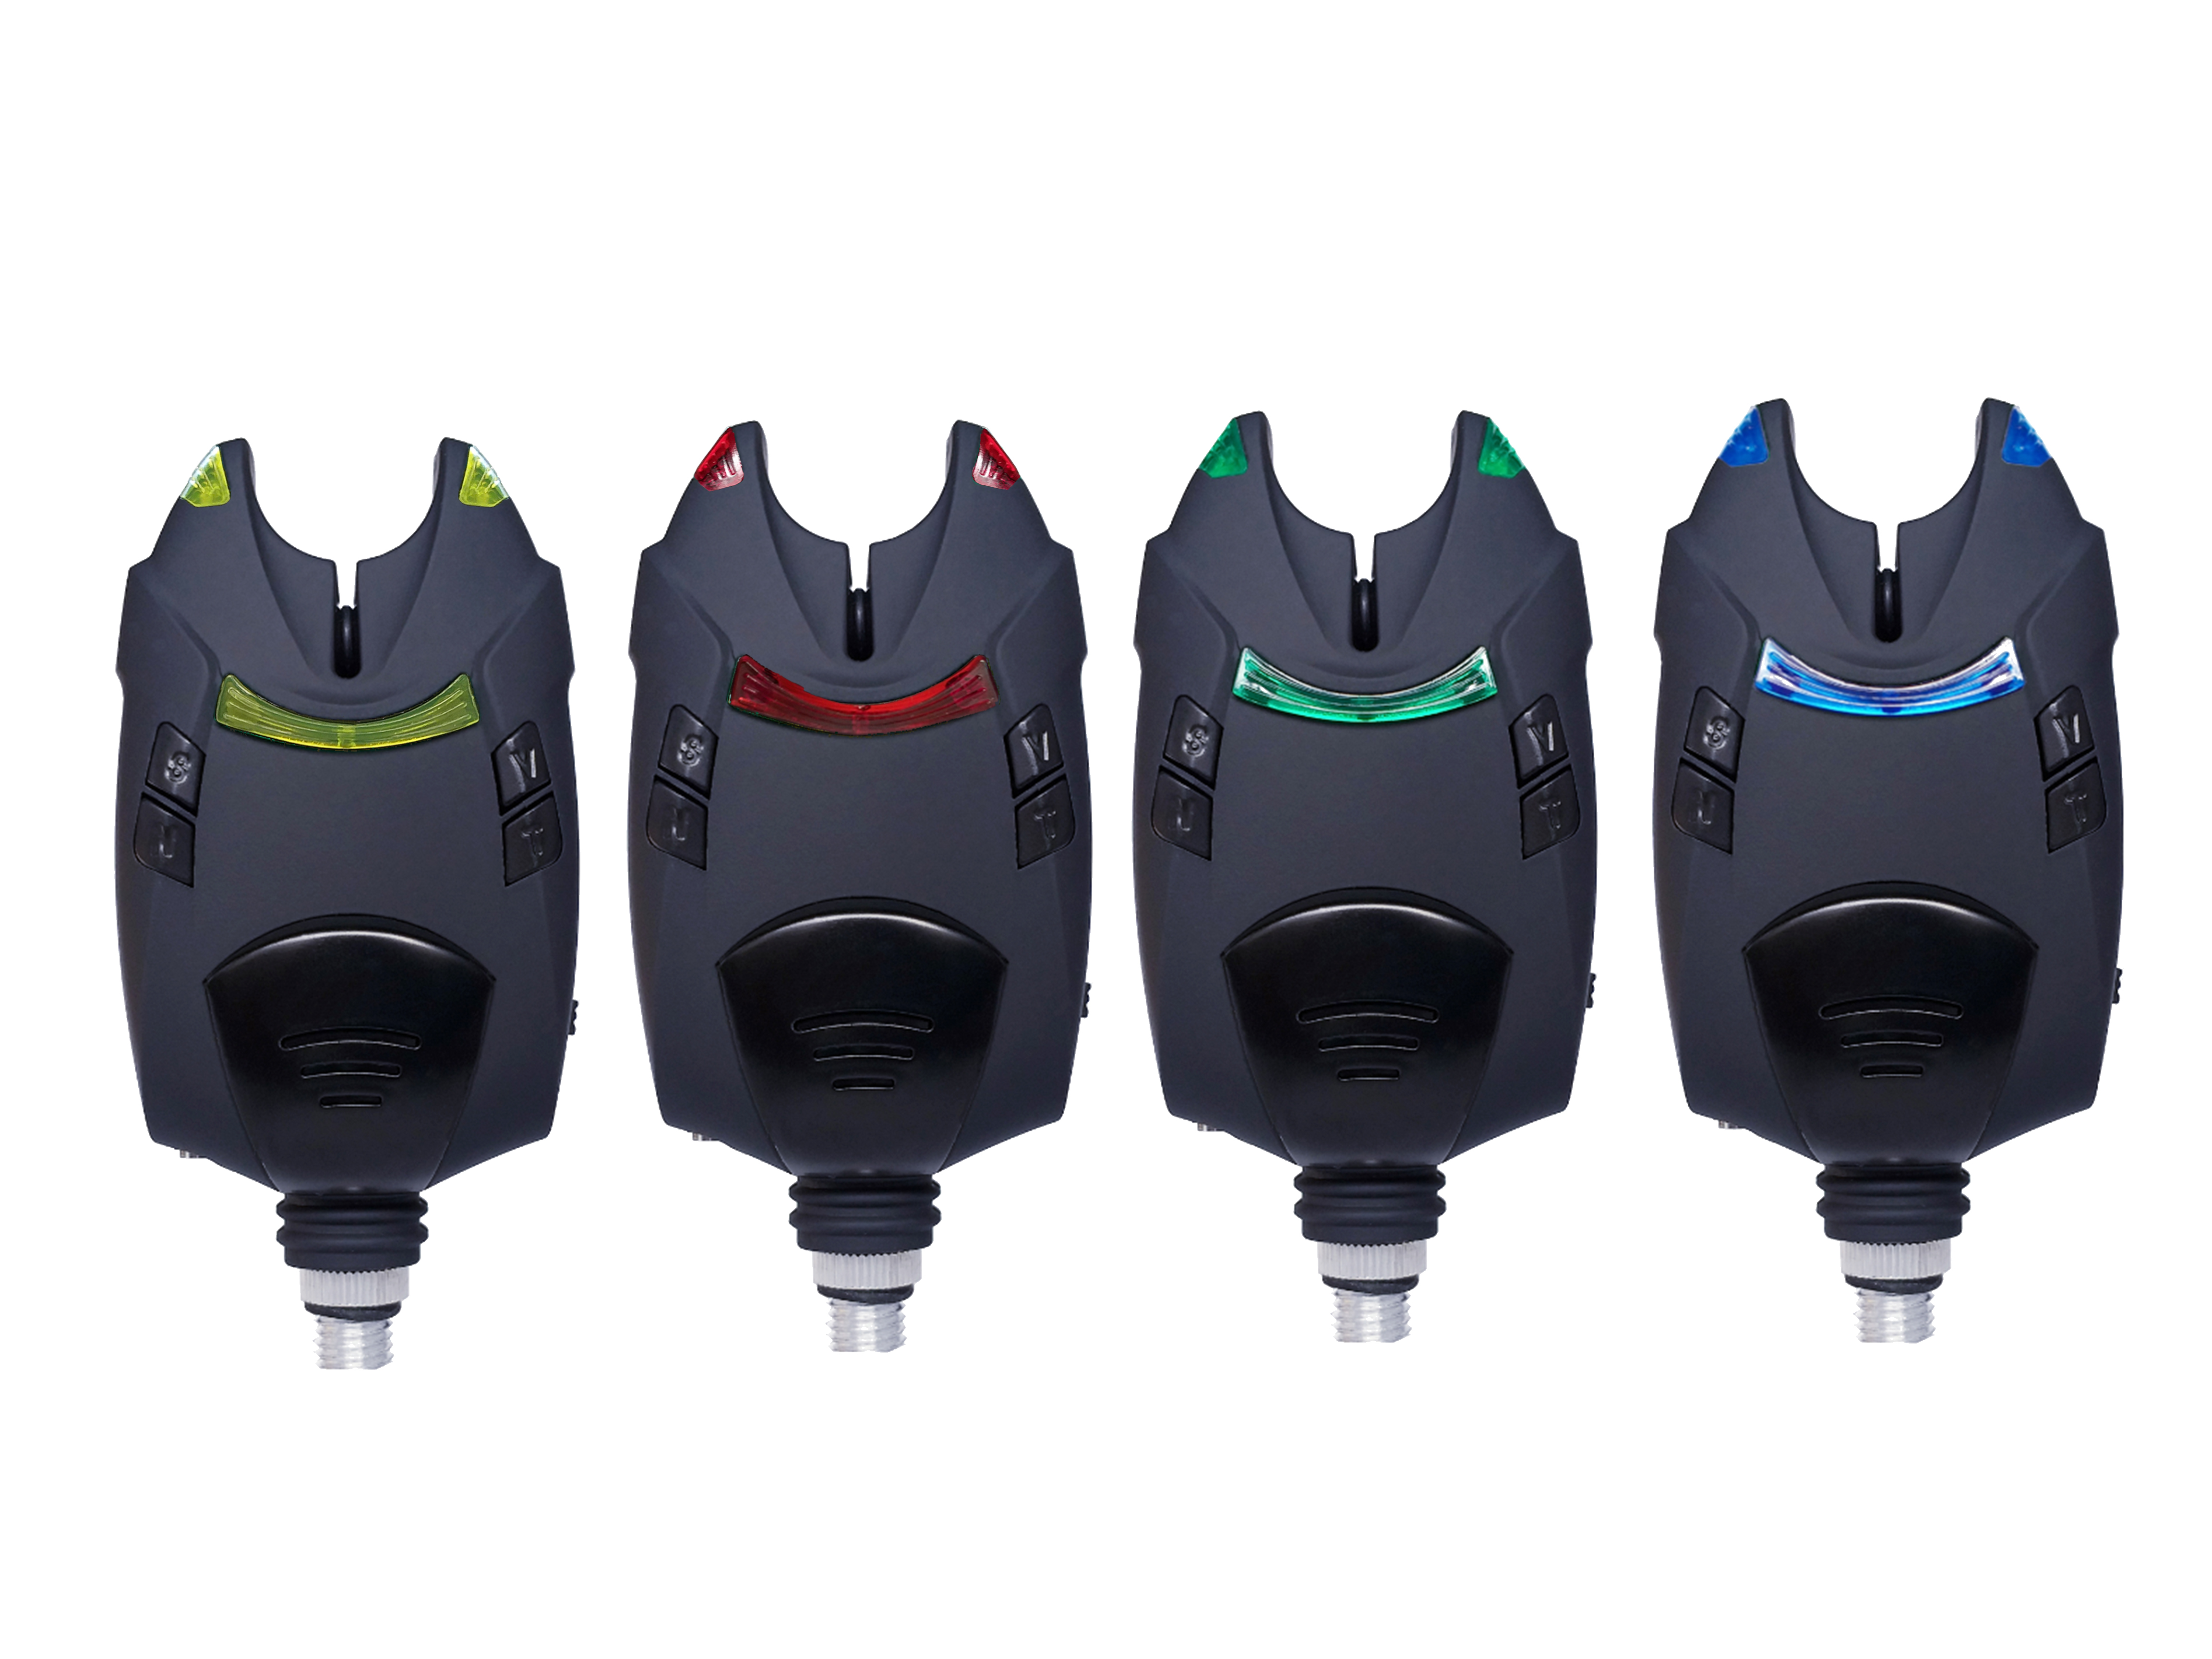 4PCS  Of Induction Alarm Set Automatic High-decibel Fishing Alarm